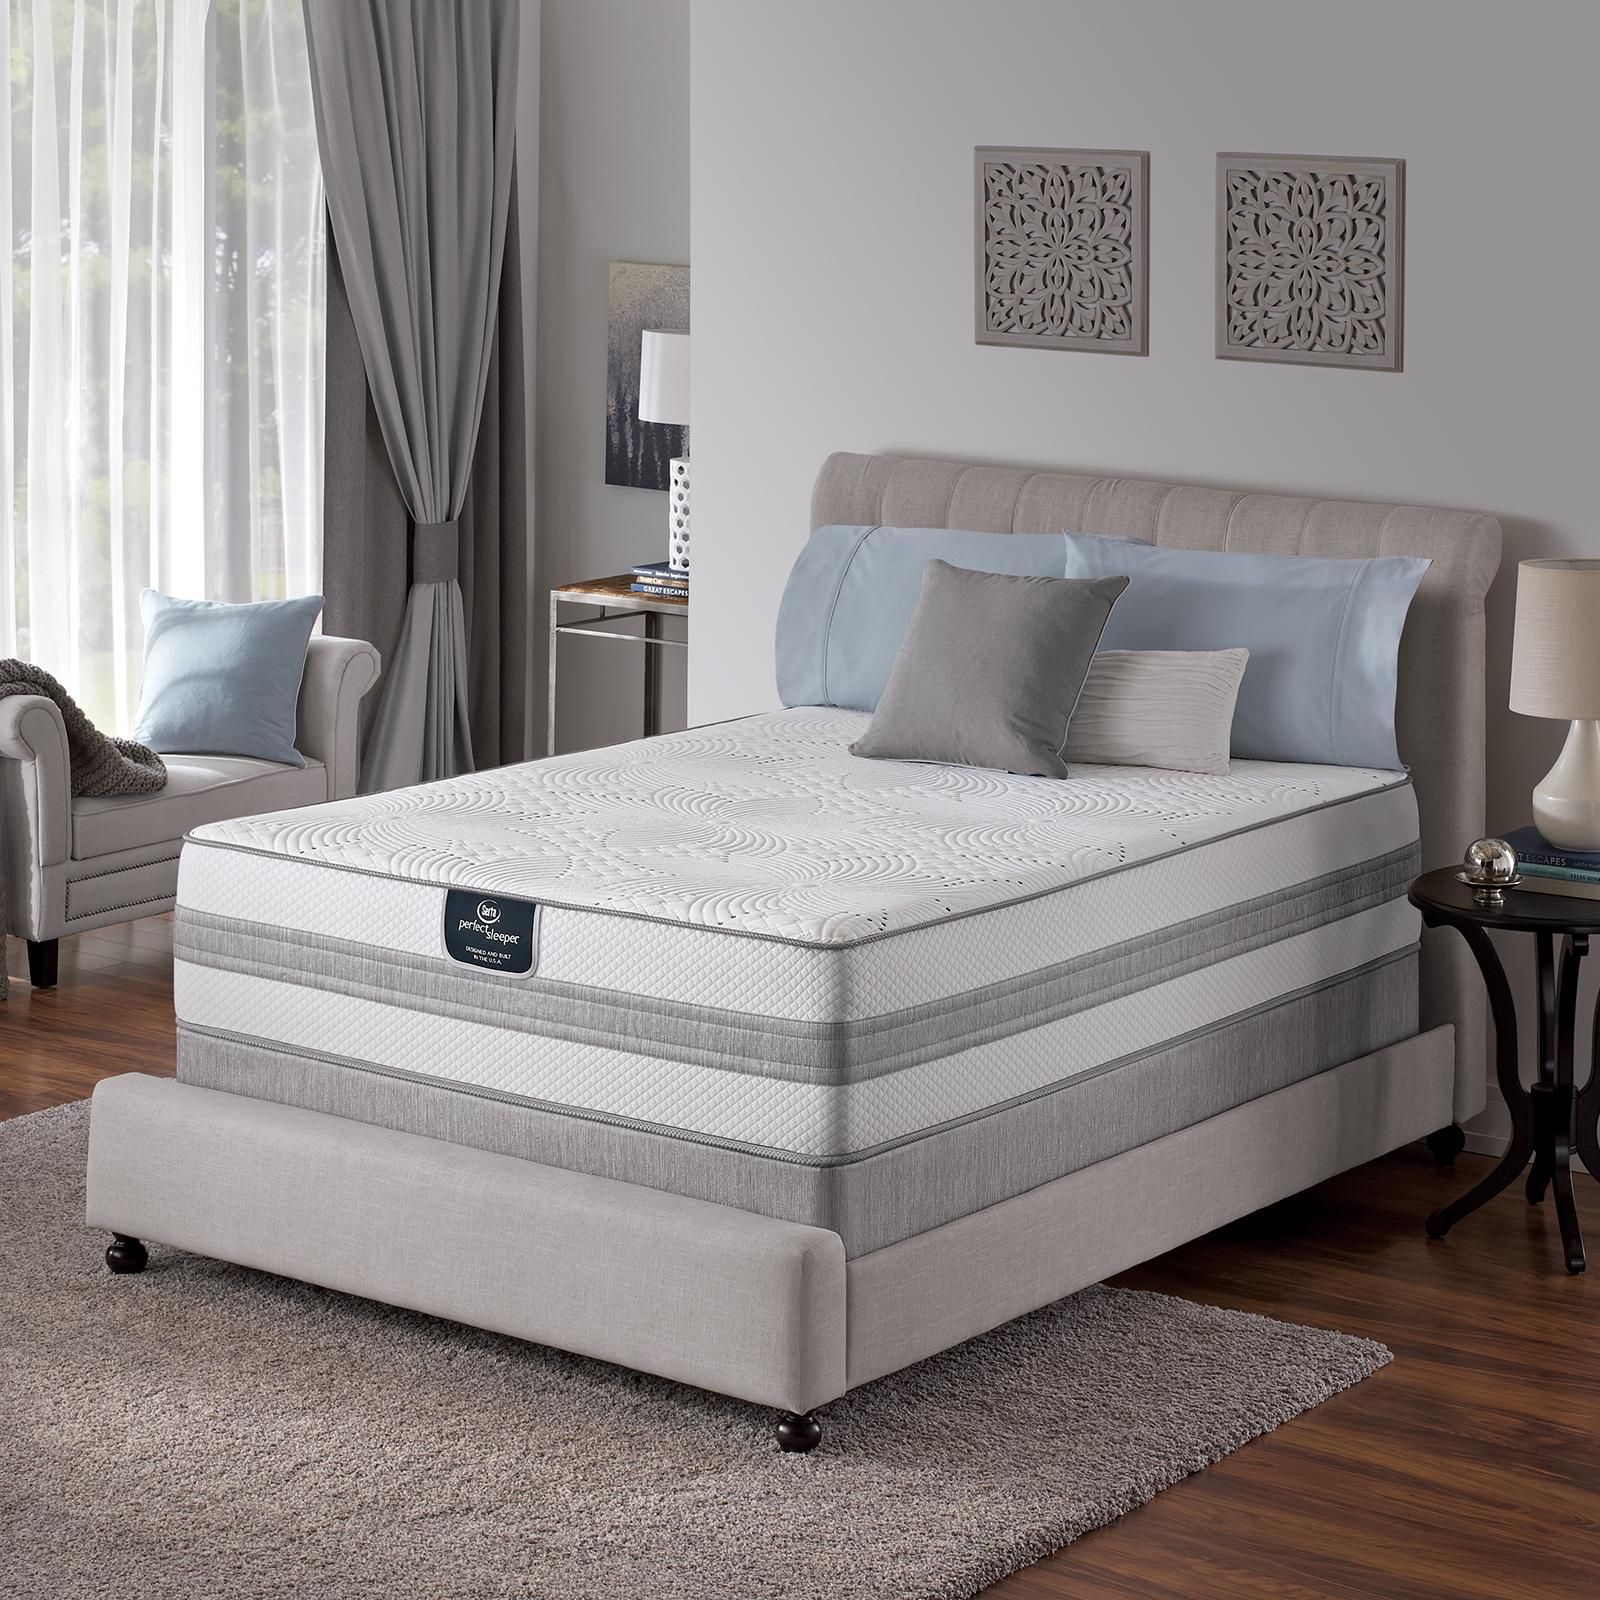 Serta Perfect Sleeper Elm Grove Lux Firm King Mattress - Home Mattresses & Accessories